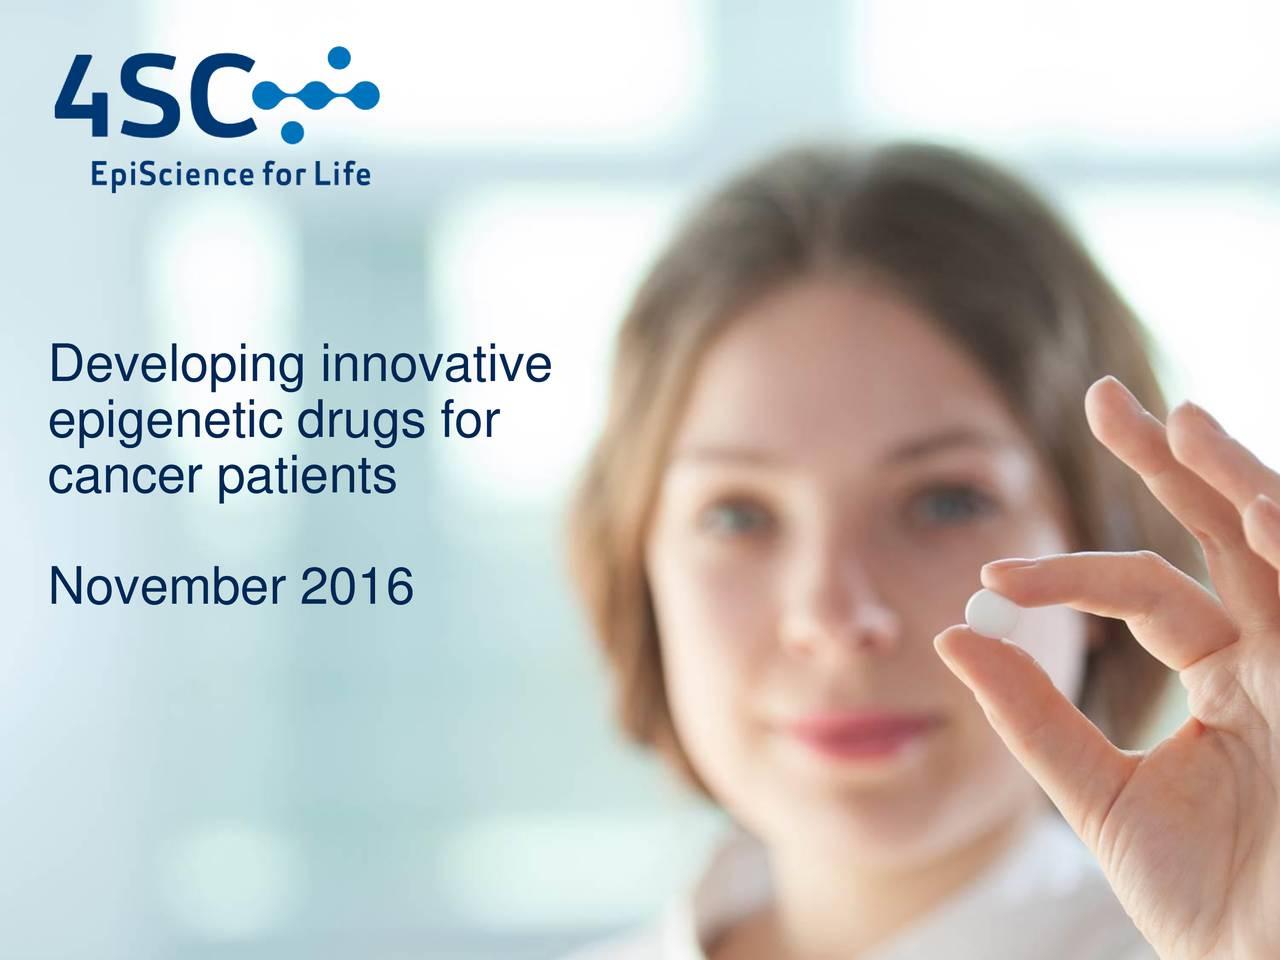 epigenetic drugs for cancer patients November 2016